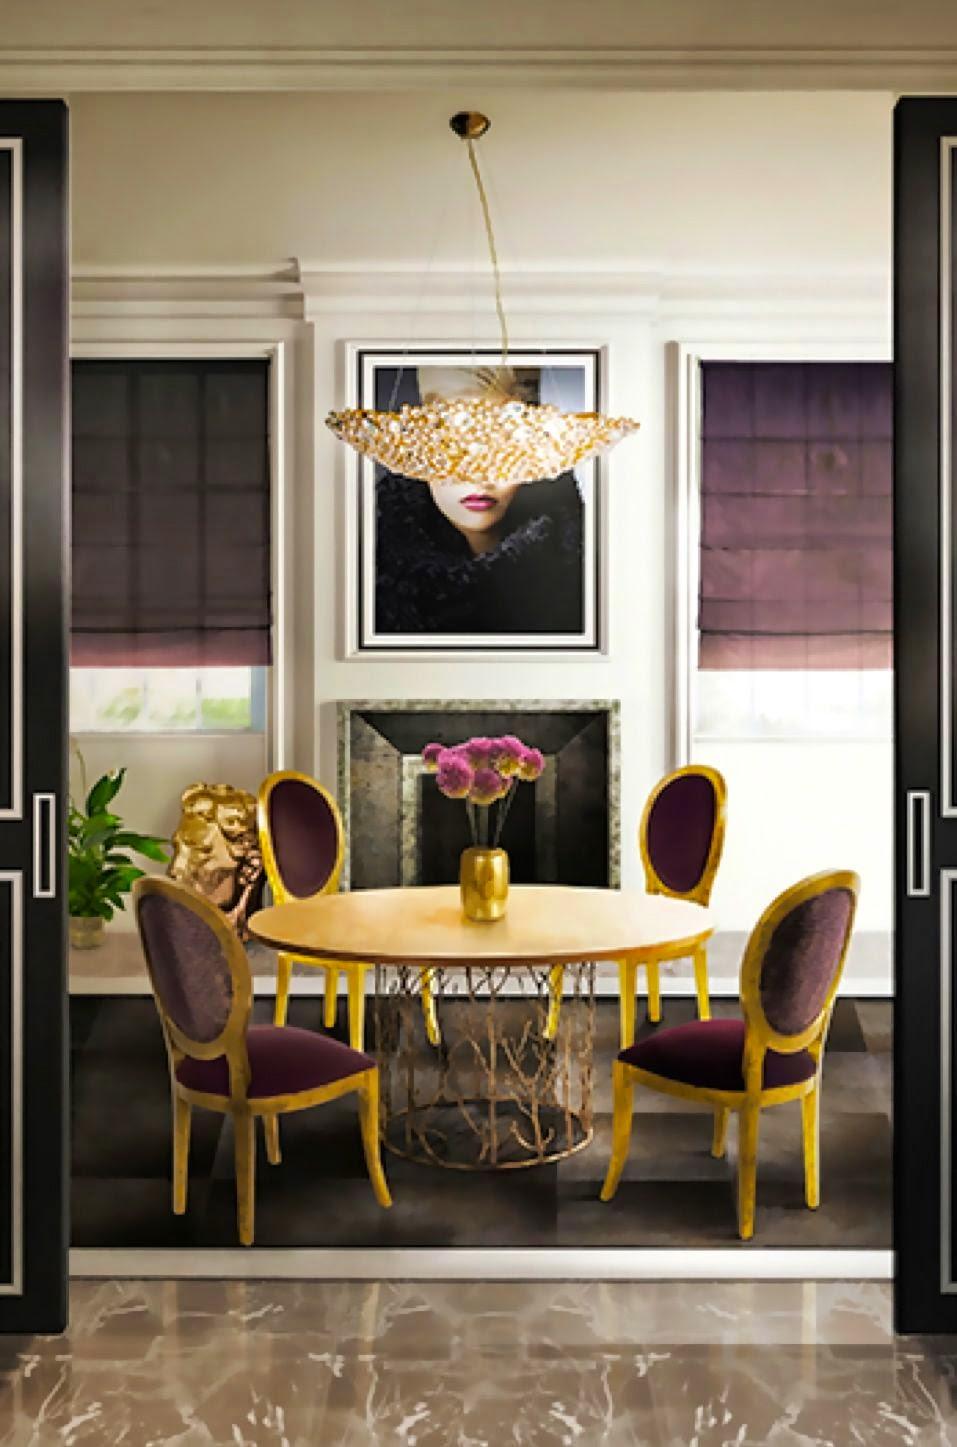 koket-covet-maison objet paris 2015-paris design agenda  COVET LOUNGE – Celebrating design with friends!  COVET LOUNGE – Celebrating design with friends! koket 5